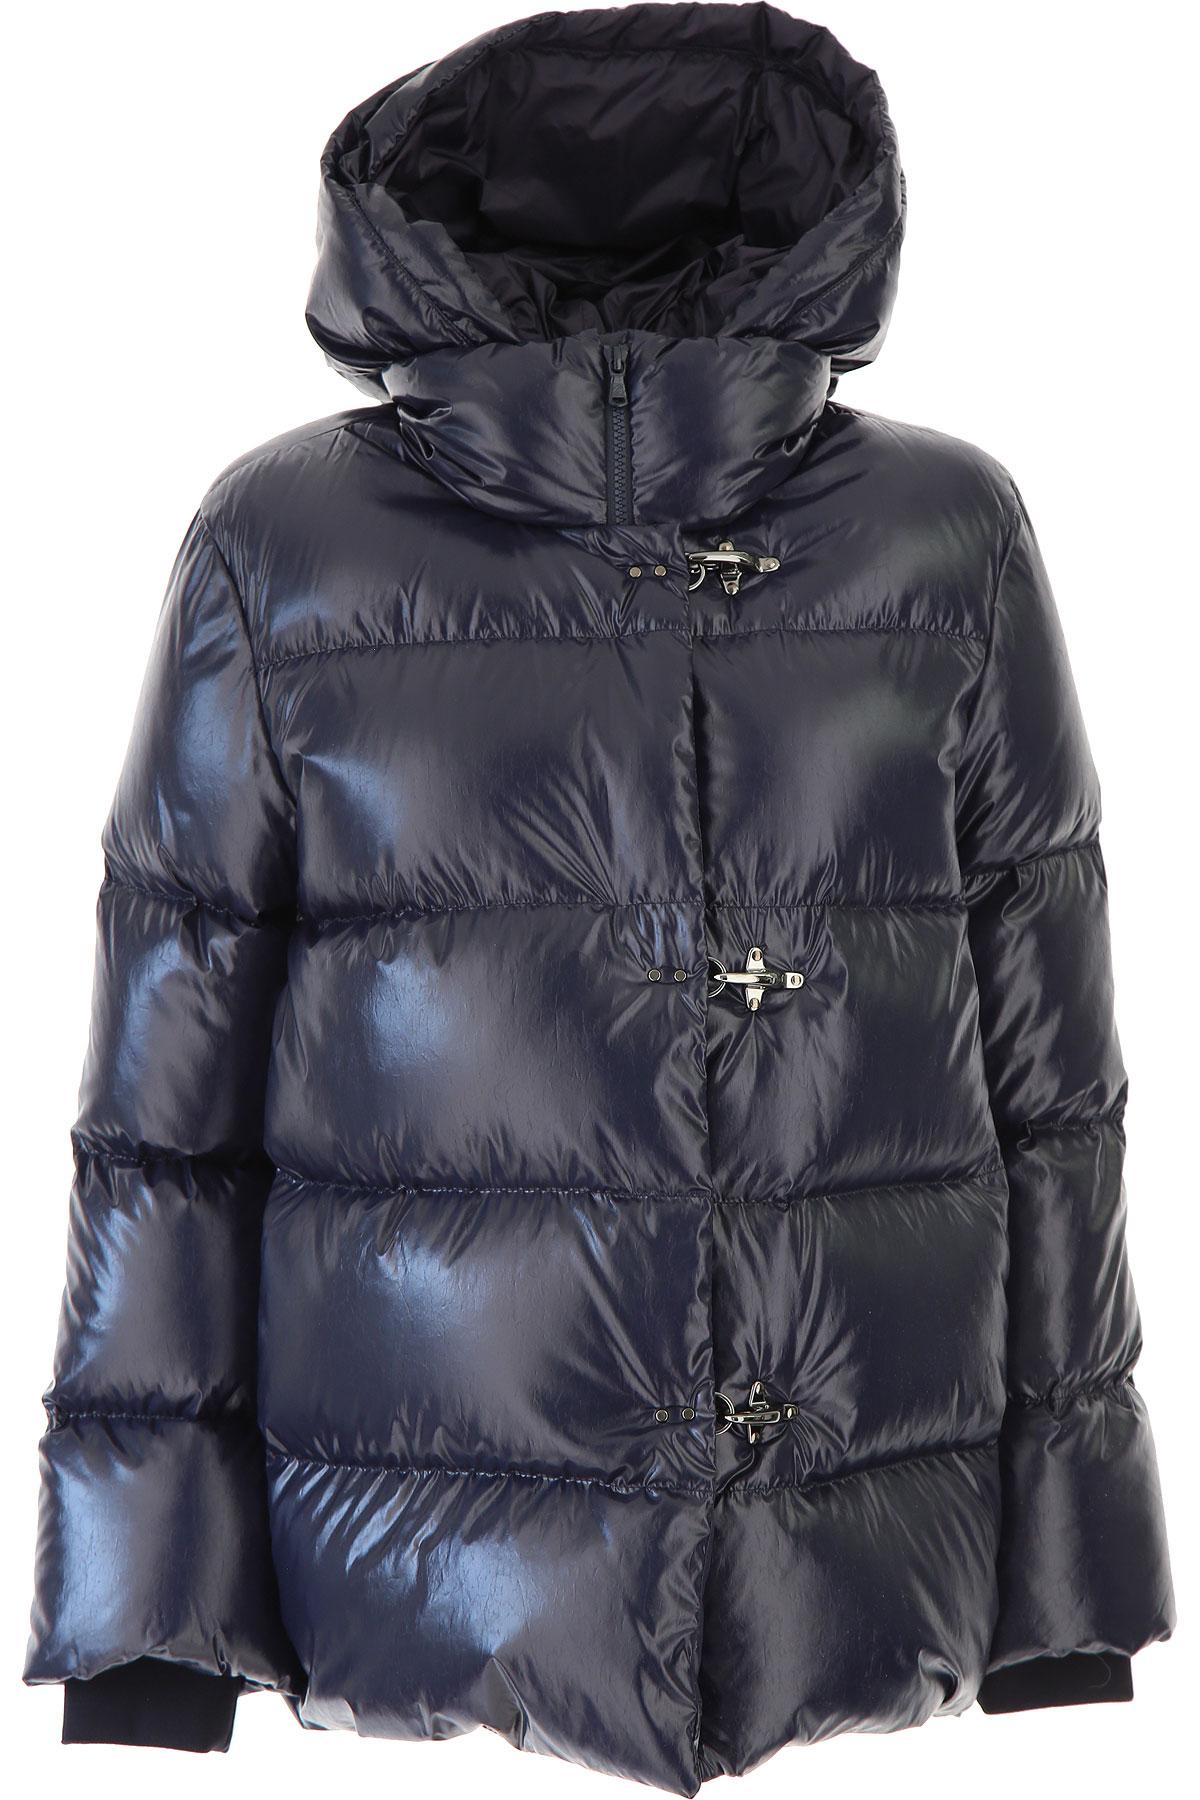 Fay Down Jacket for Women, Puffer Ski Jacket, Midnight Blue, Down, 2019, 4 6